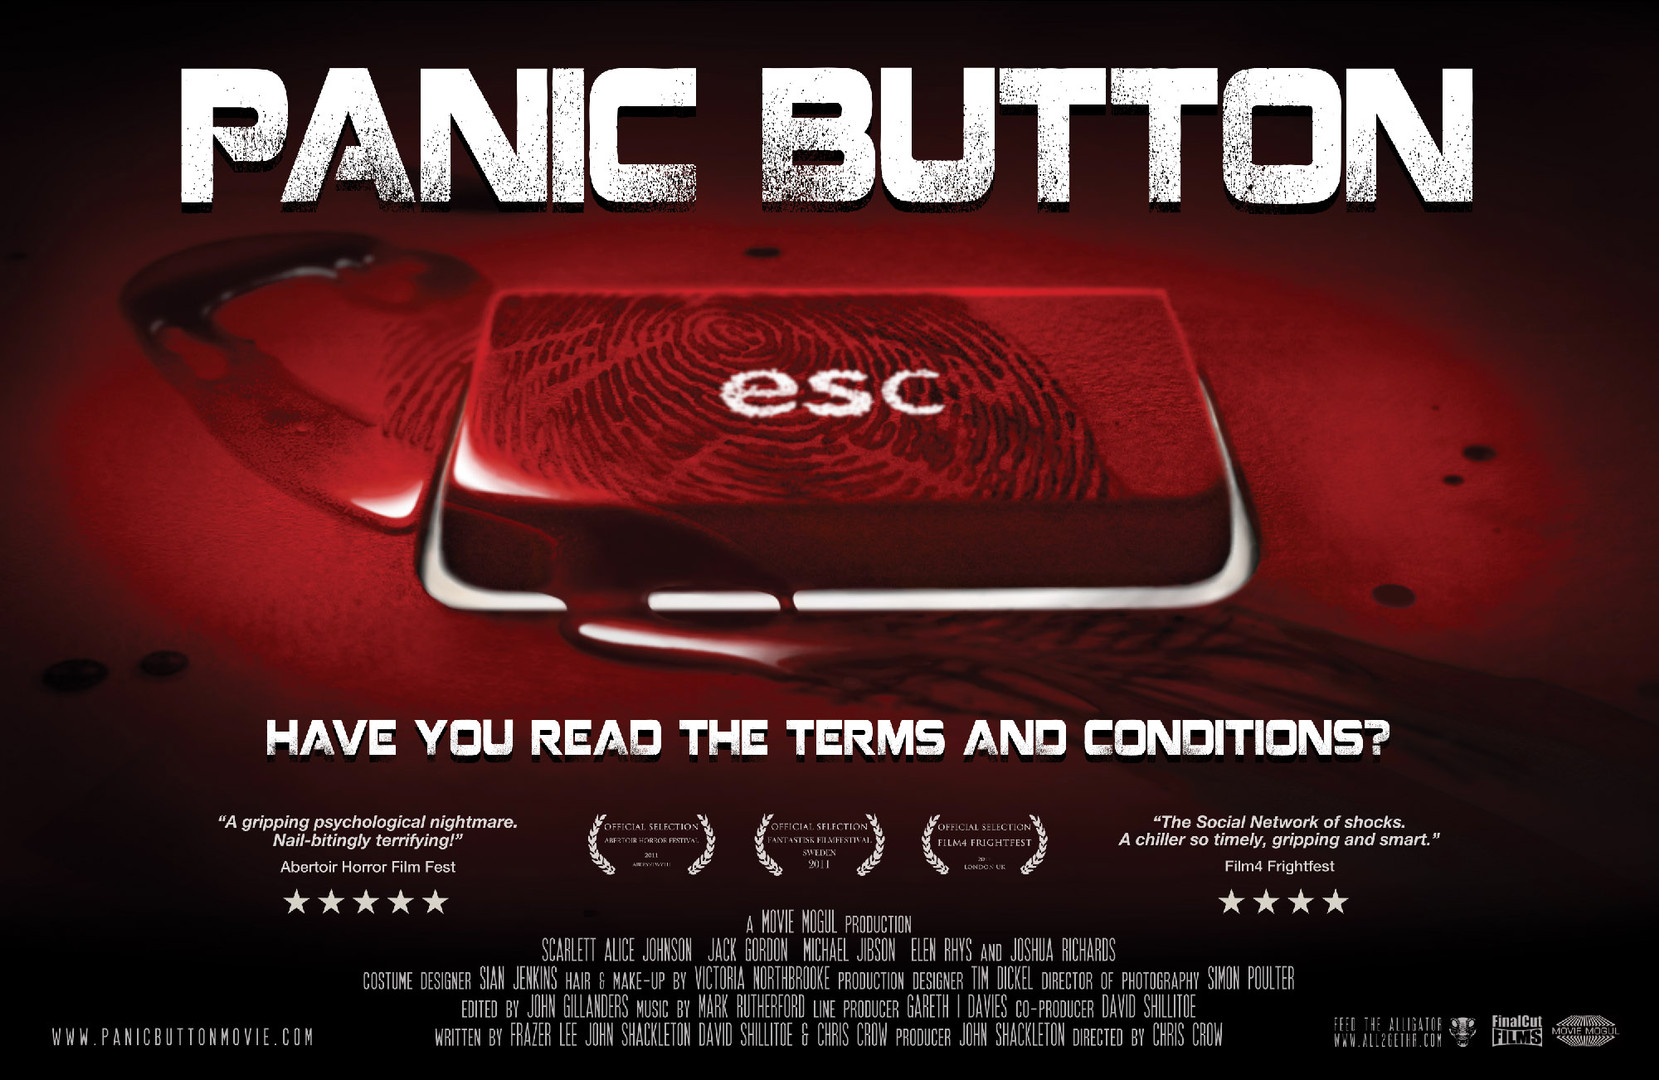 Panic Button alt poster design.